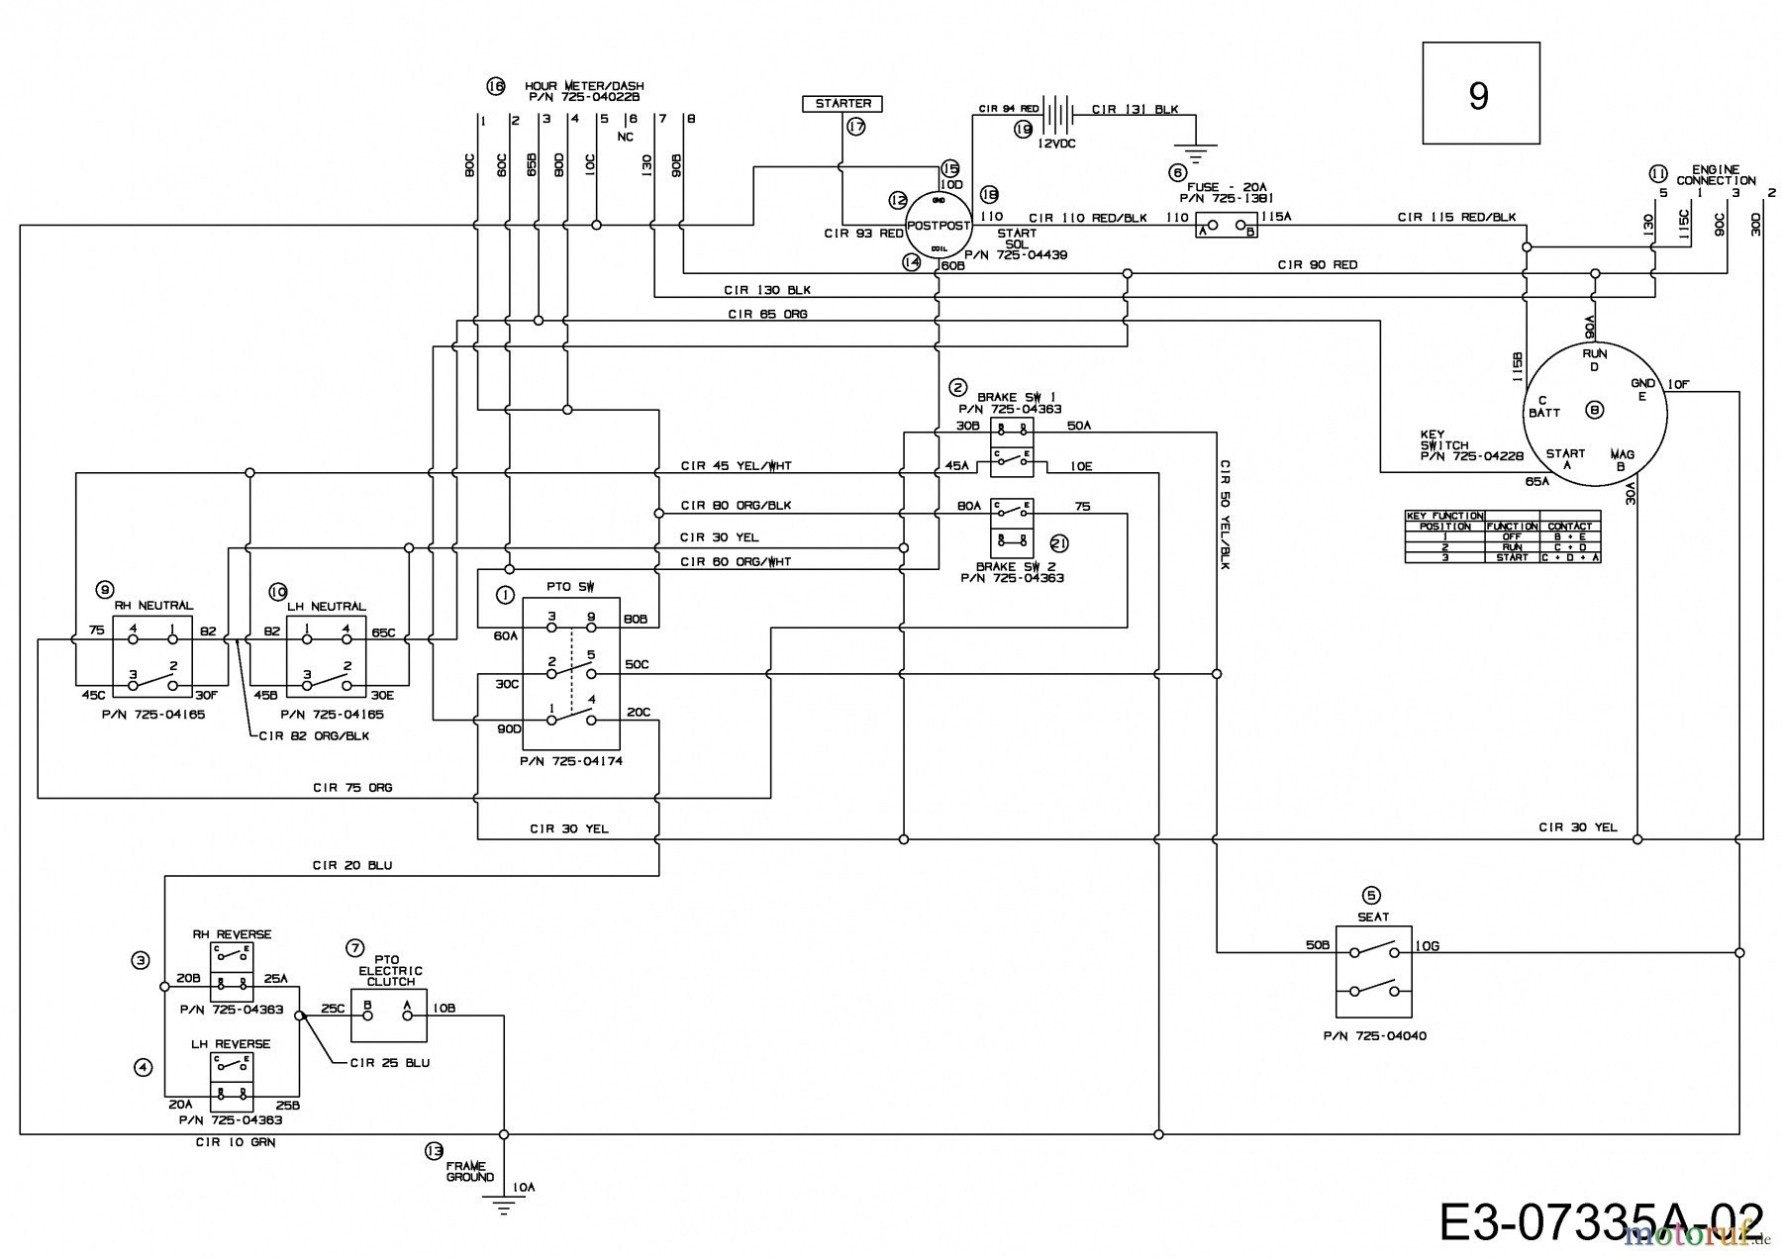 1965 Rotax 247 Wiring Diagram Rotax Wiring Diagram Plete Wiring Schemas Of 1965 Rotax 247 Wiring Diagram